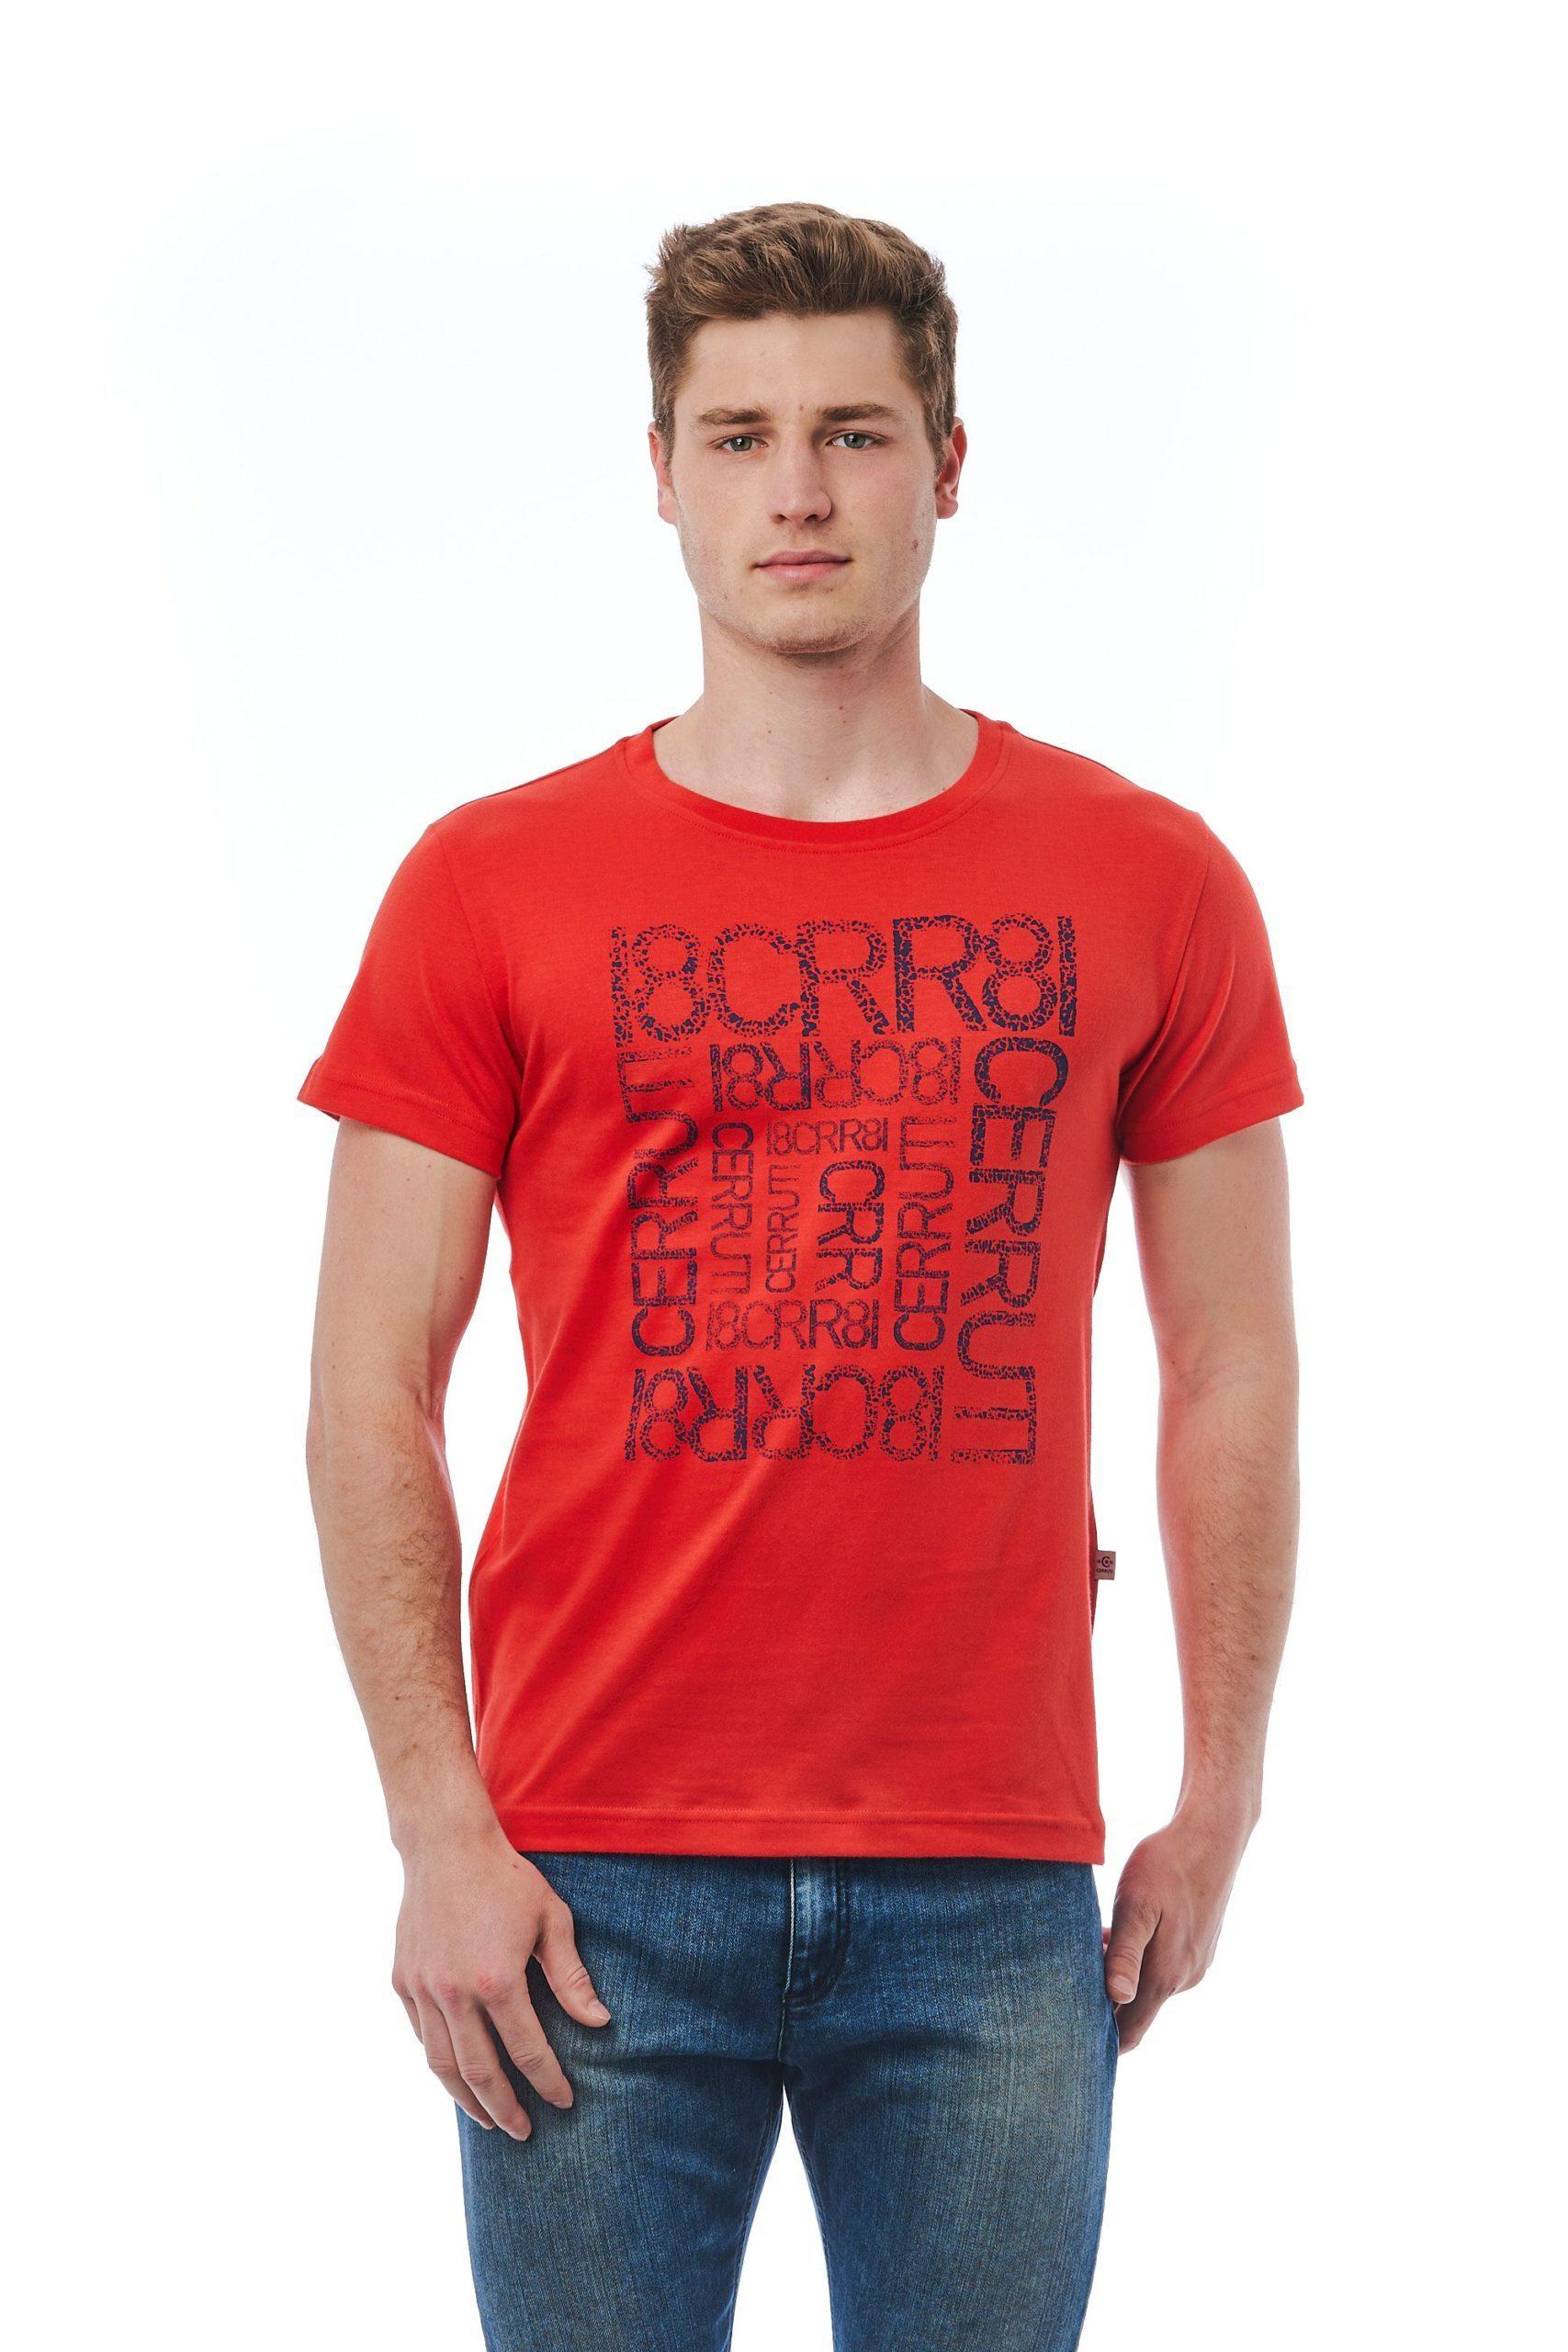 Cerruti 1881 Men's Rosso T-Shirt Red CE1409920 - M